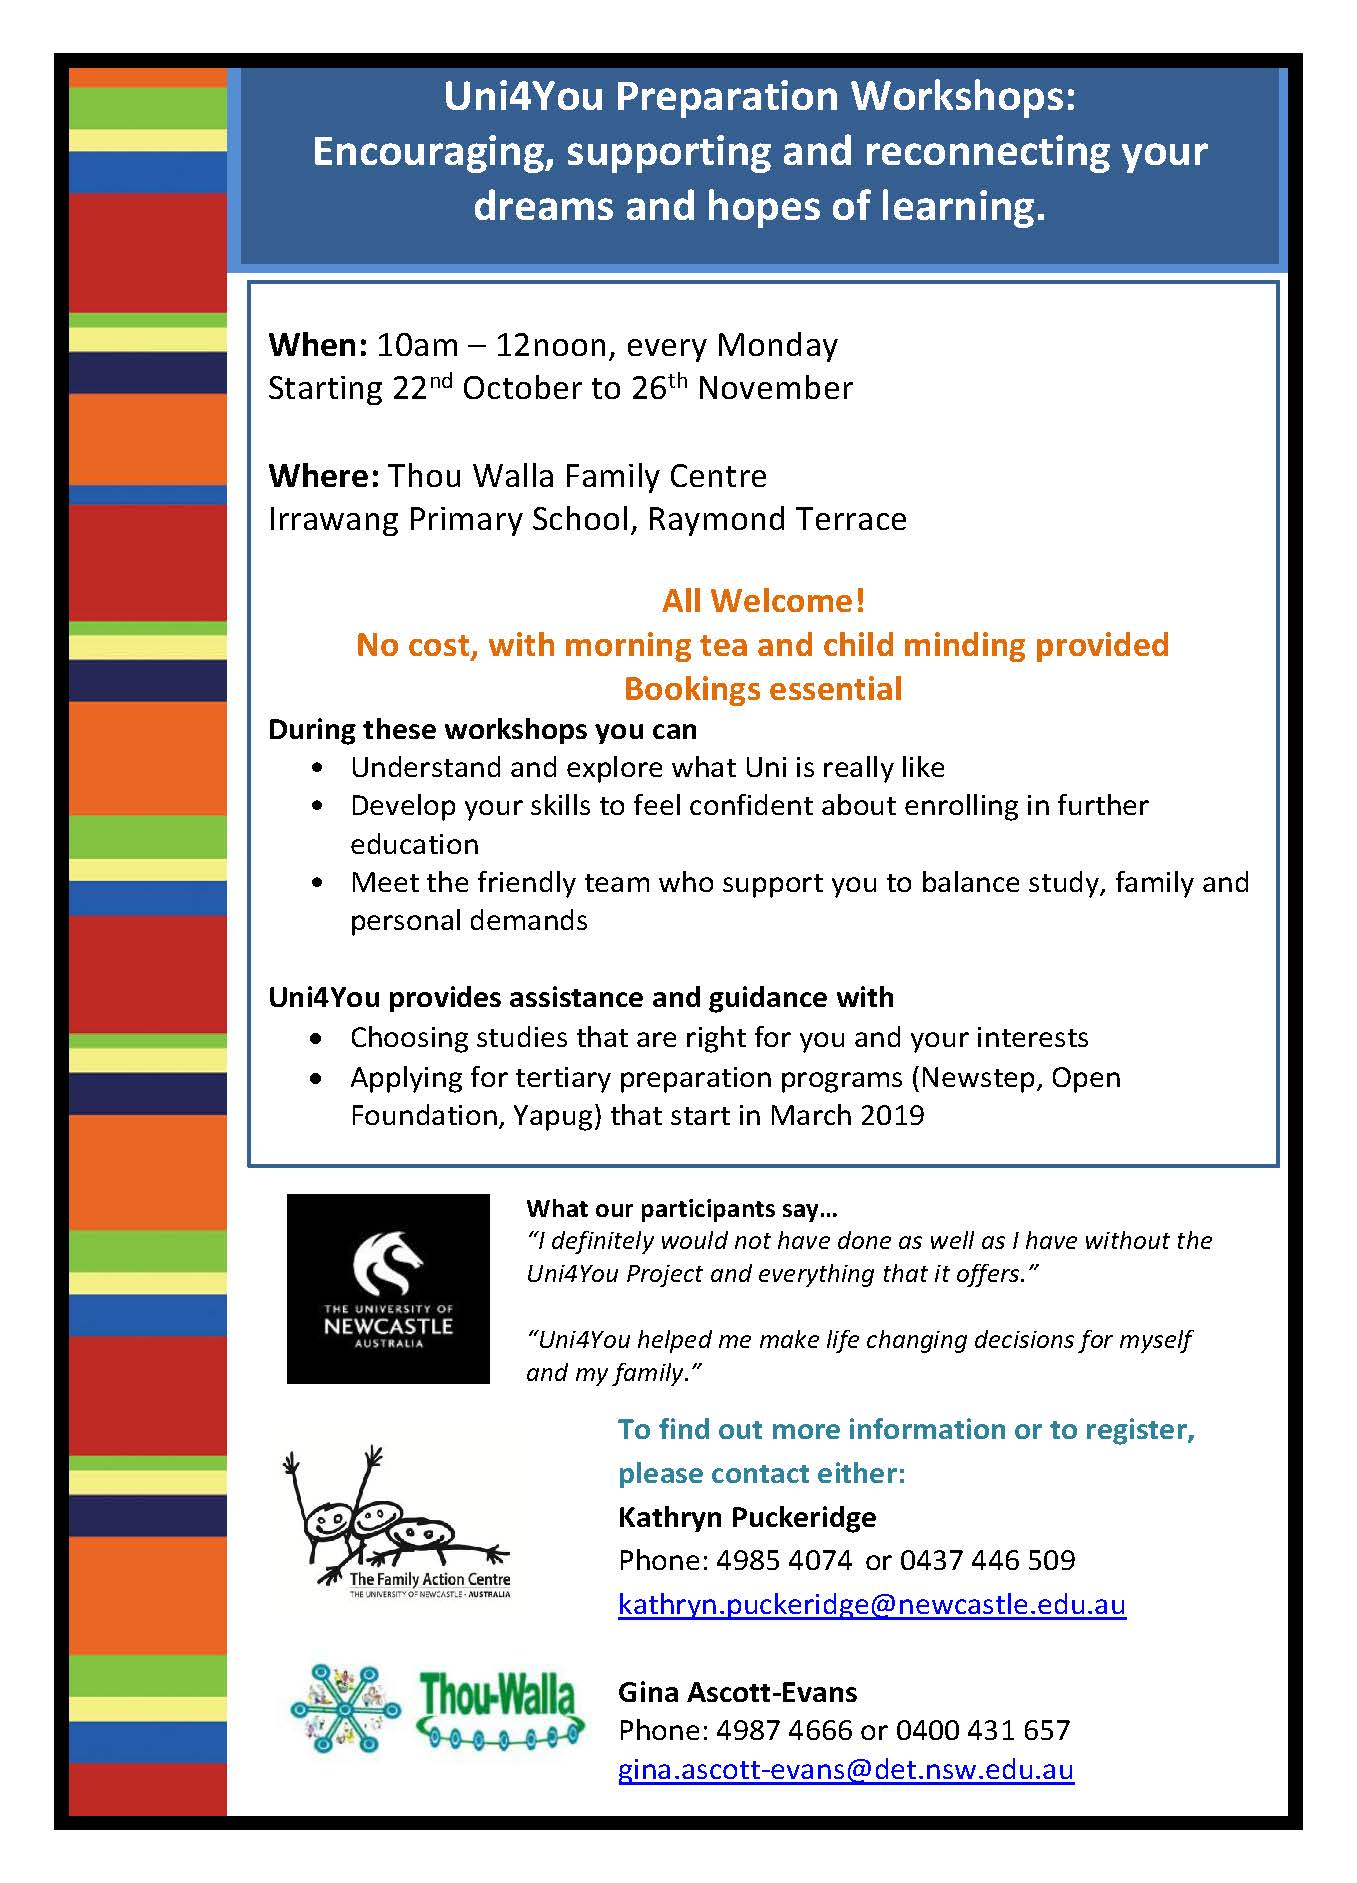 ThouWalla_2018_Uni4You Prep Workshops Flyer_KP